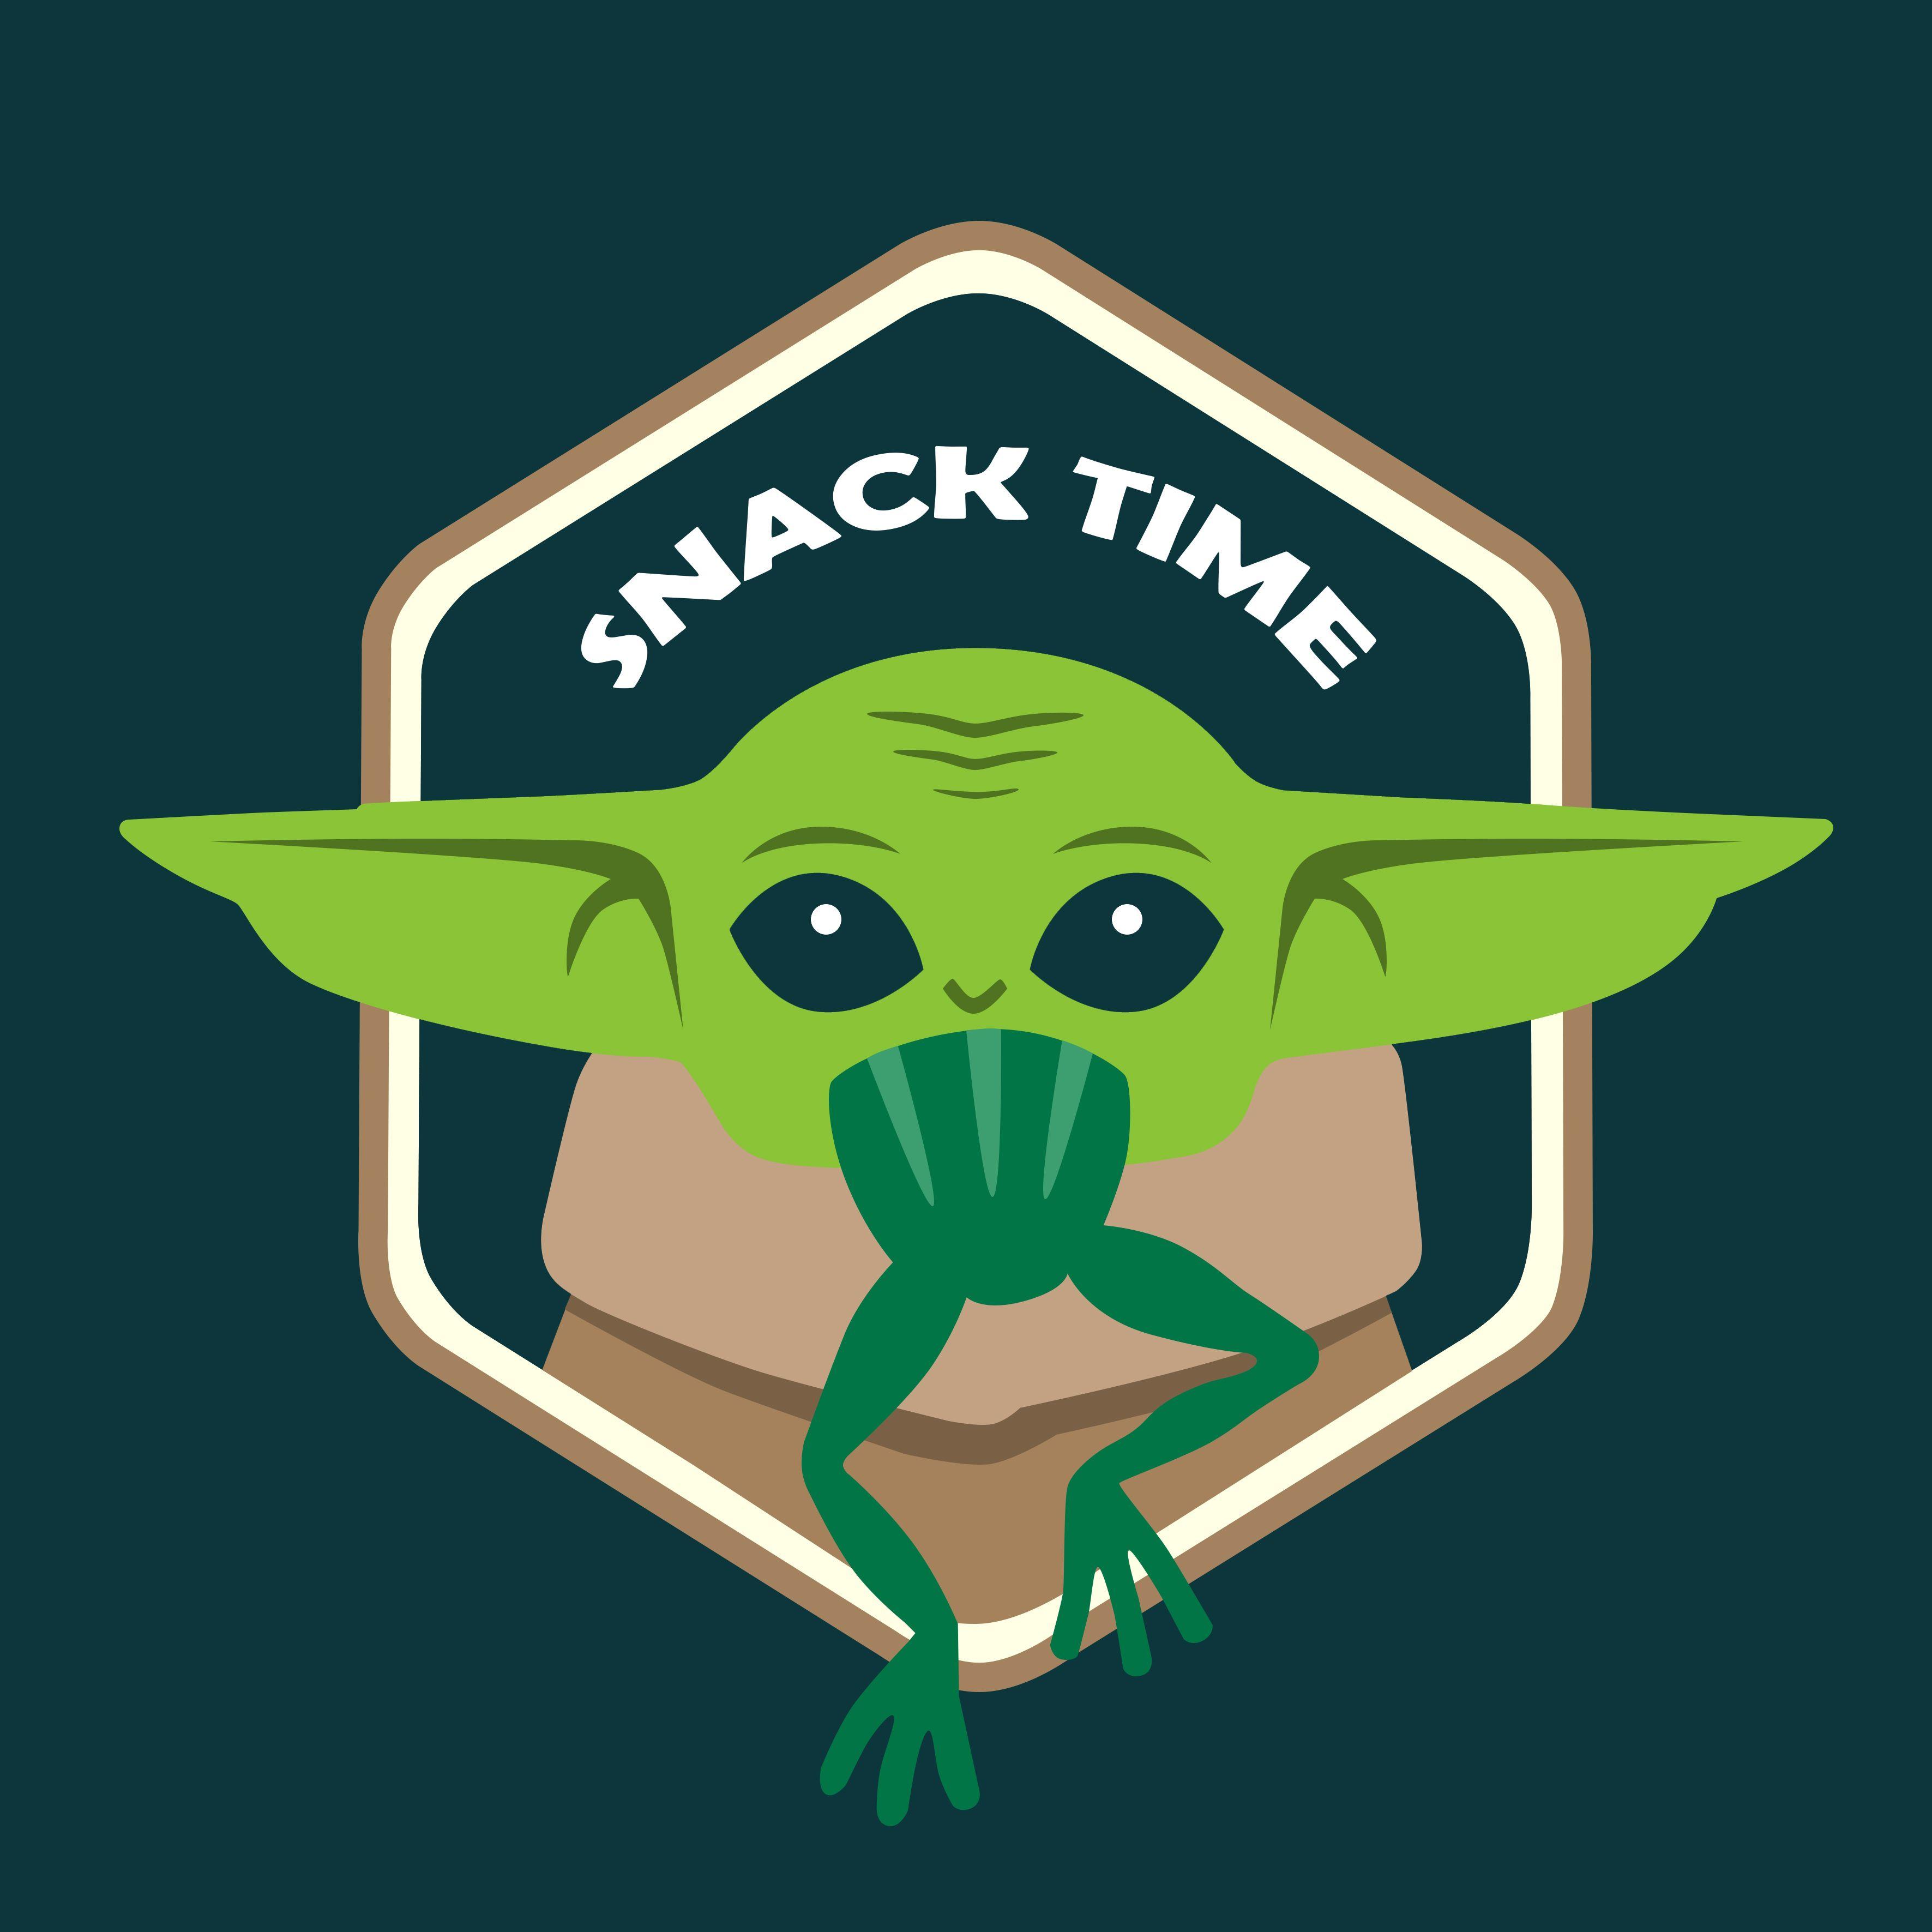 Baby Yoda Snack Time T Shirt Eat Frog Star Wars Fan Art The Mandalorian Yoda Minimalism Star Wars Fan Art Star Wars Fans Star Wars